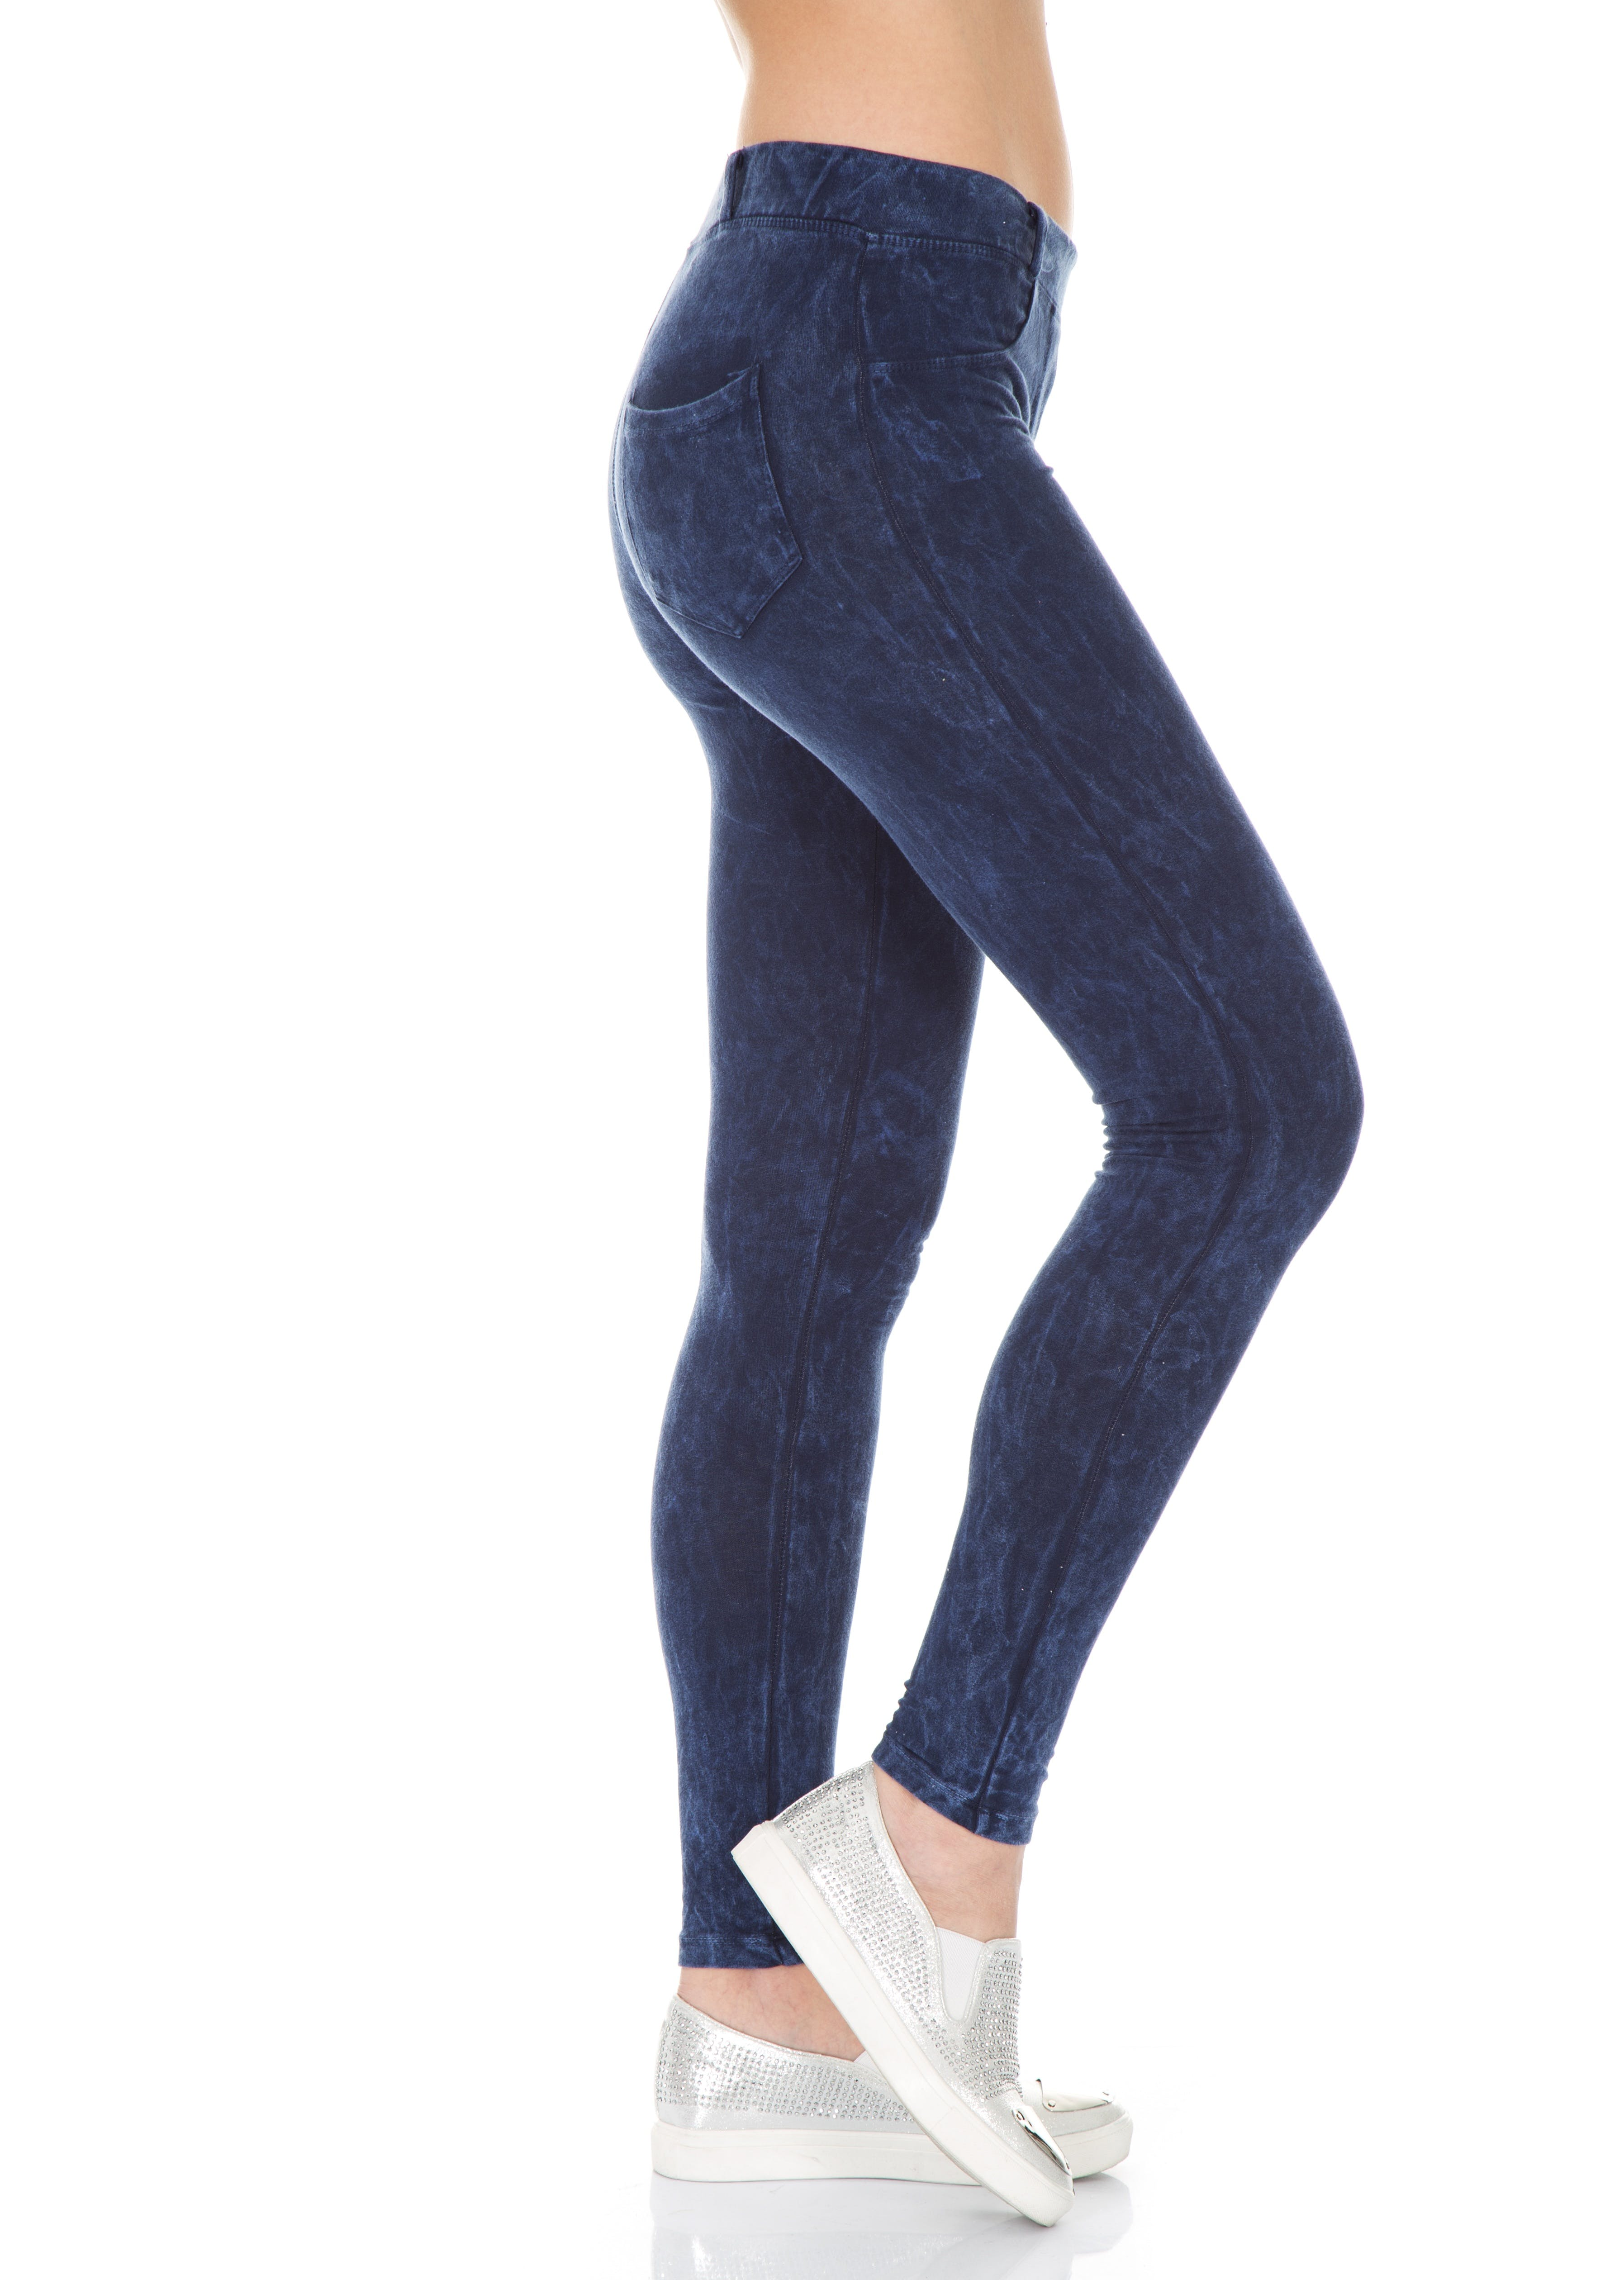 Kostnadsfri bild av ben, byxor, denim, gymnastikskor